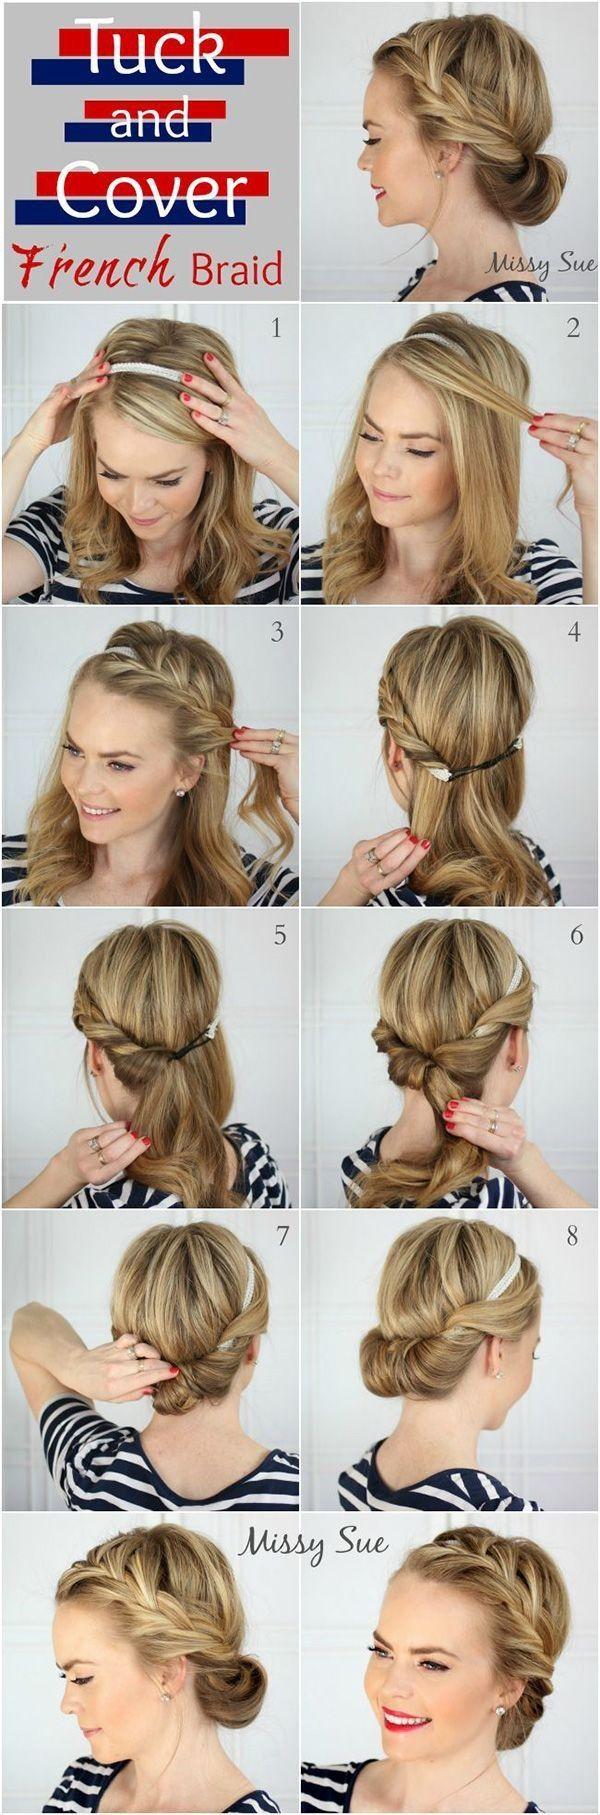 50 Simple Five Minute Hairstyles For Office Women Diy Frisuren Haarband Frisur Frisur Hochgesteckt